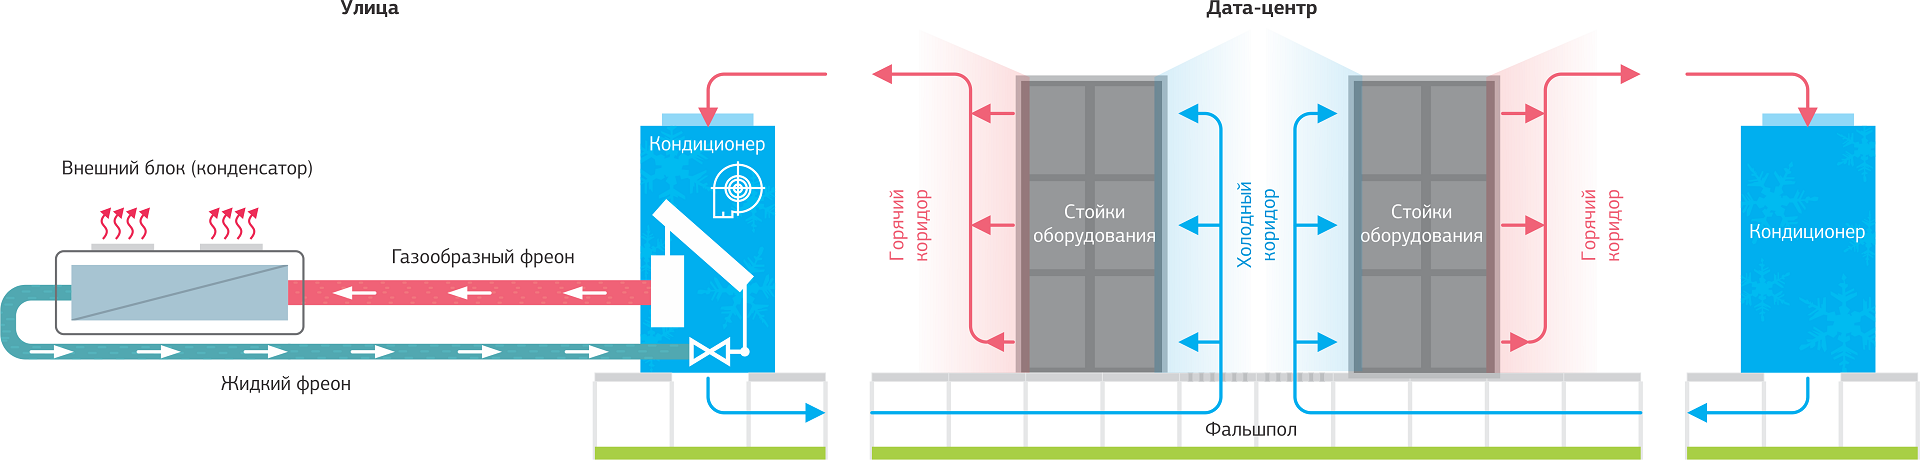 Как создавалась система холодоснабжения дата-центра NORD-4 - 2